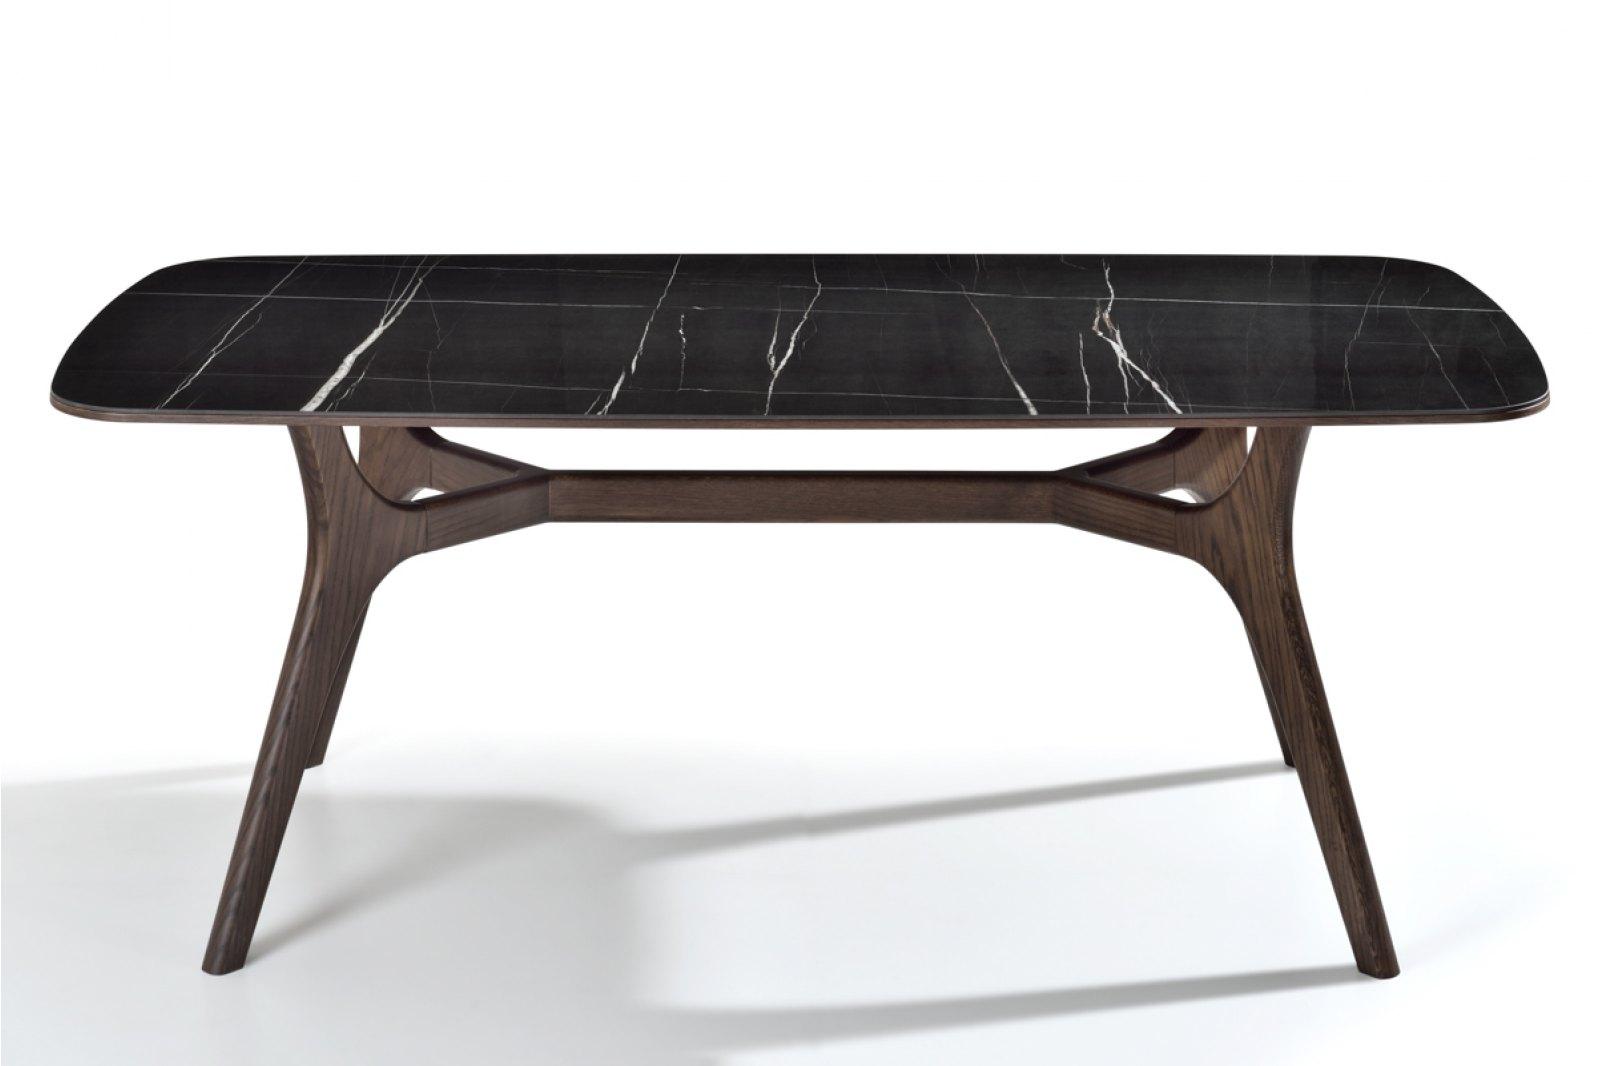 Blade Ceramic Top Dining Table 200cm / 1